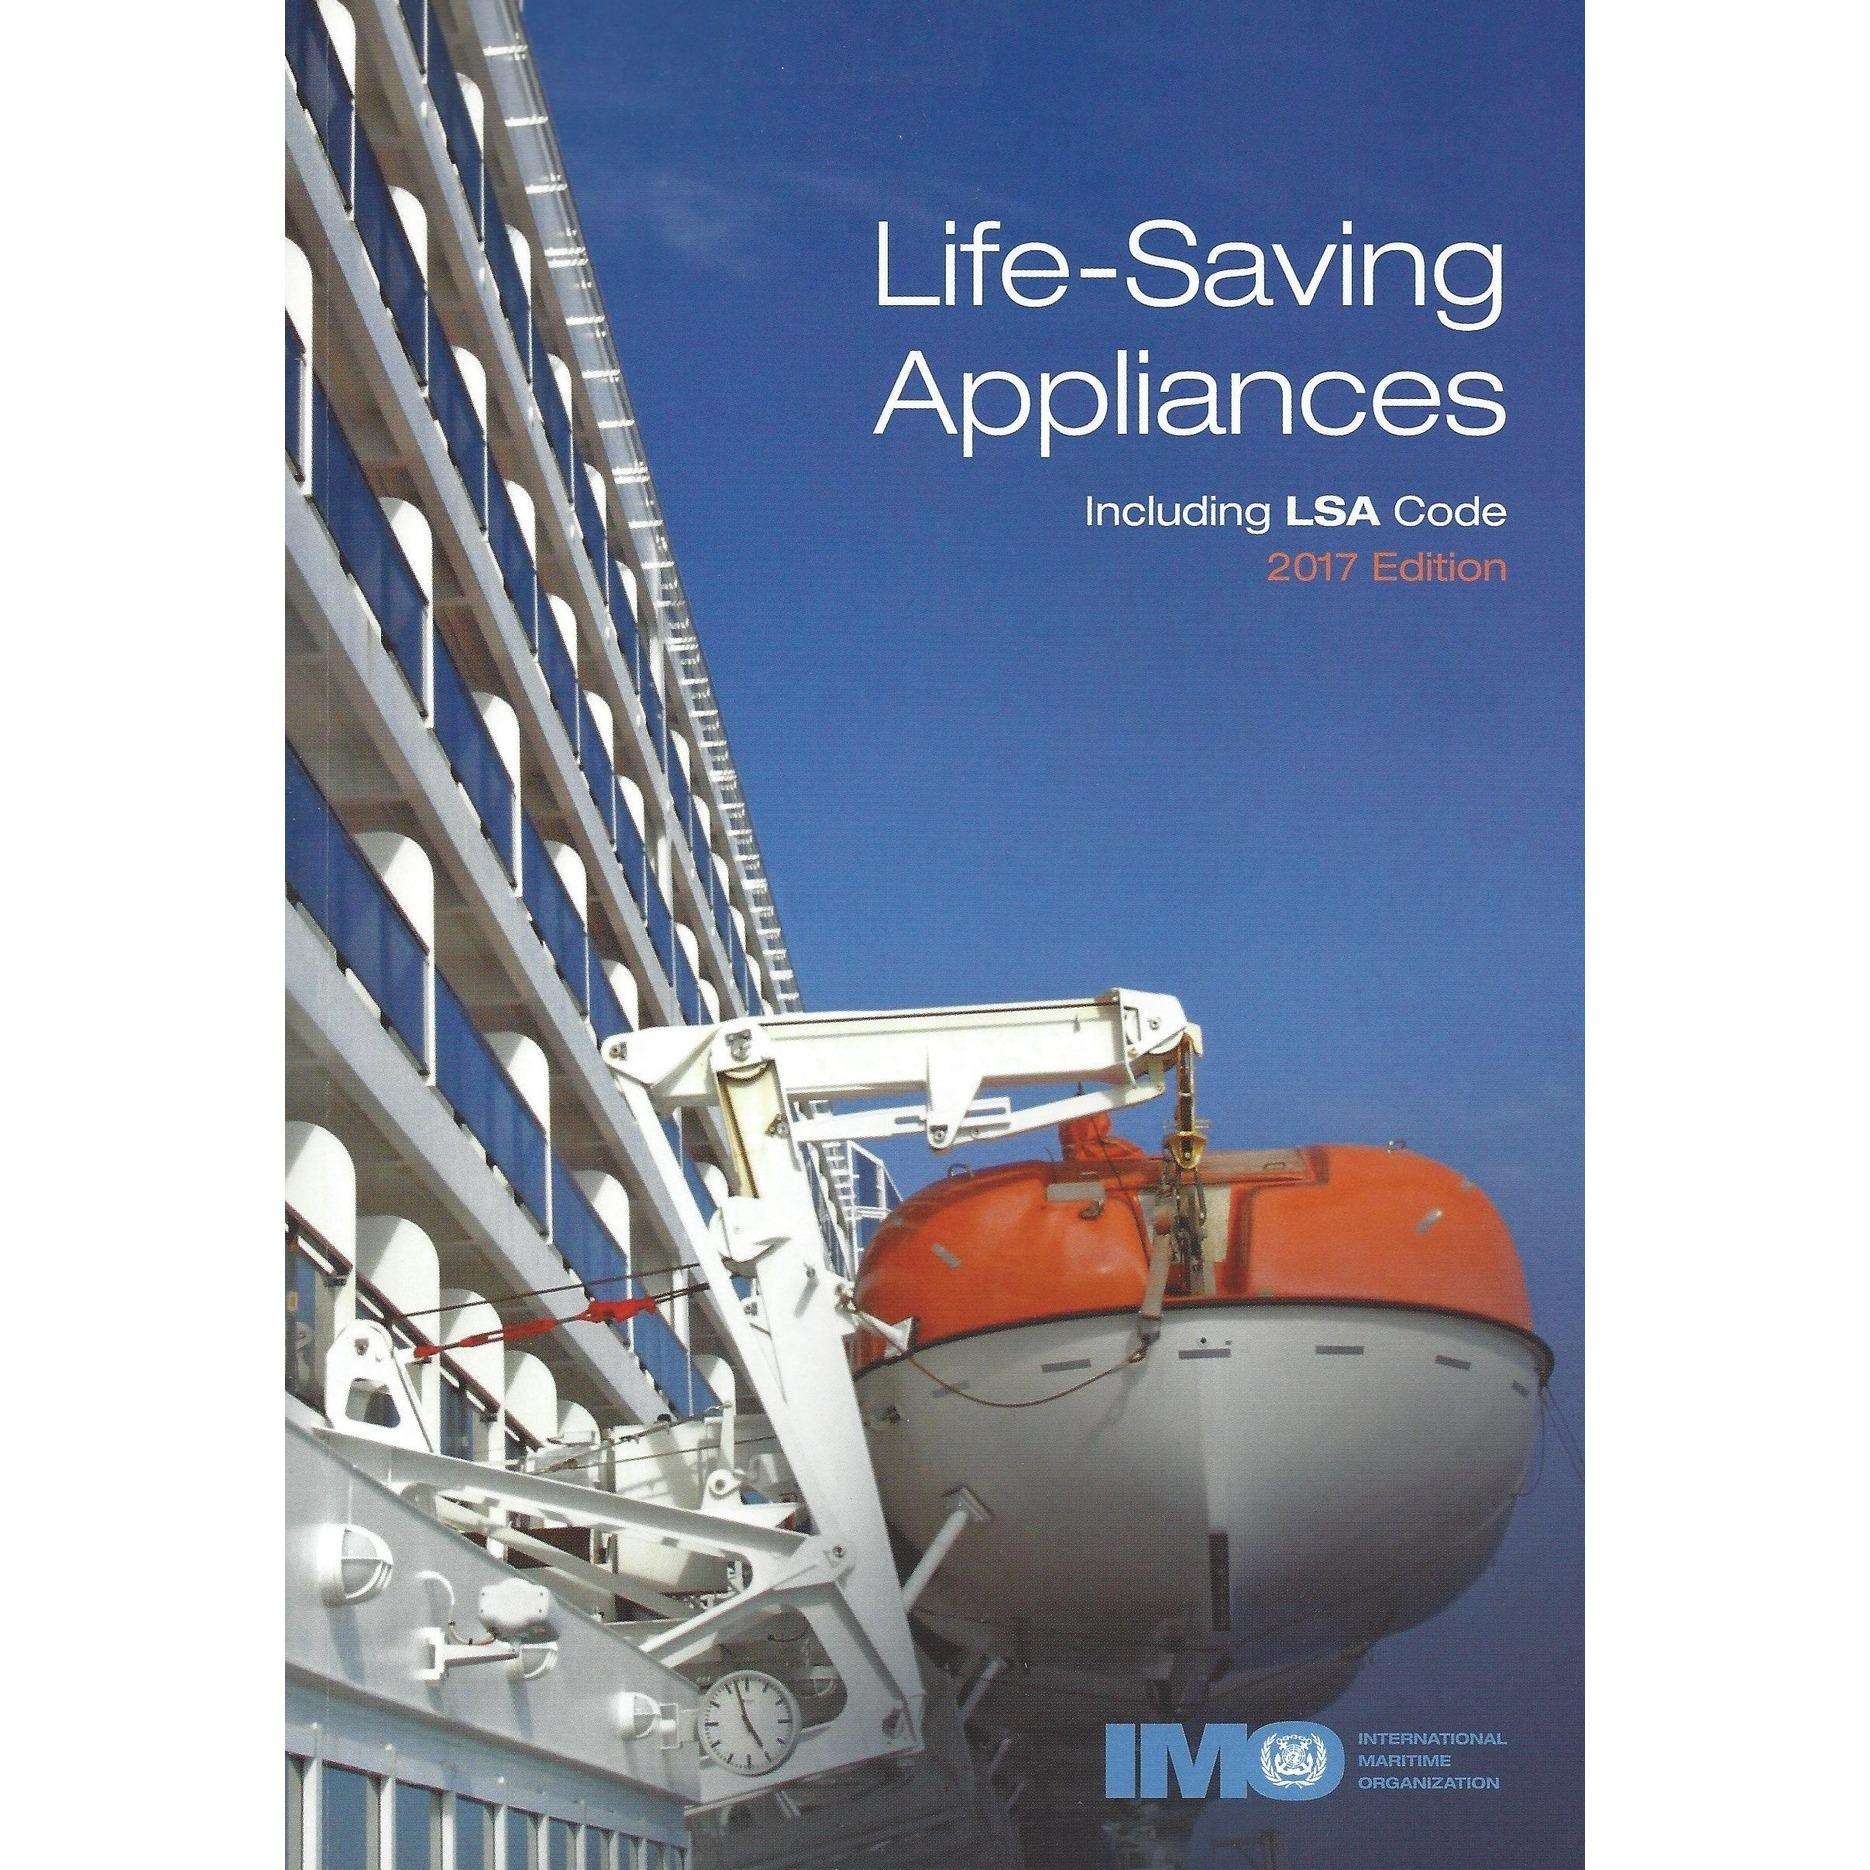 Life Saving Appliances including LSA Code 2017 Edition Books (IMO IE982E)